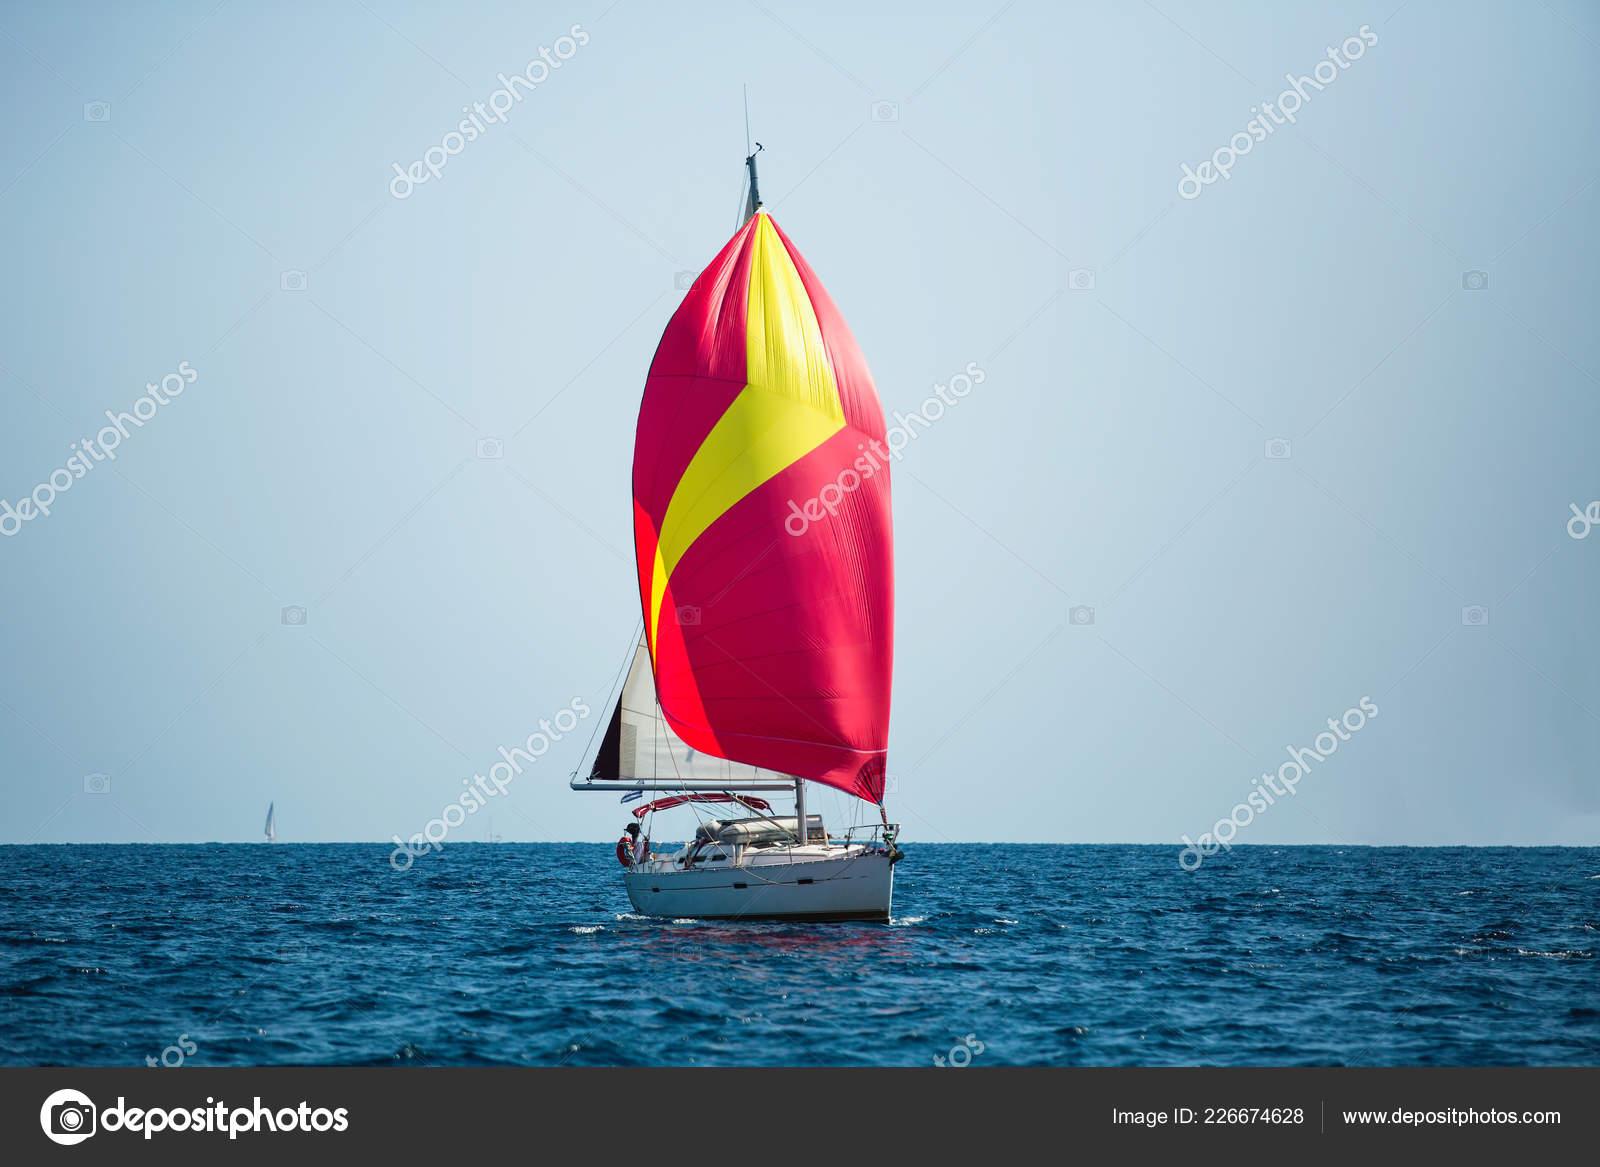 Luxury Yacht Red Sails Regatta Sailing Wind Waves Sea — Stock Photo